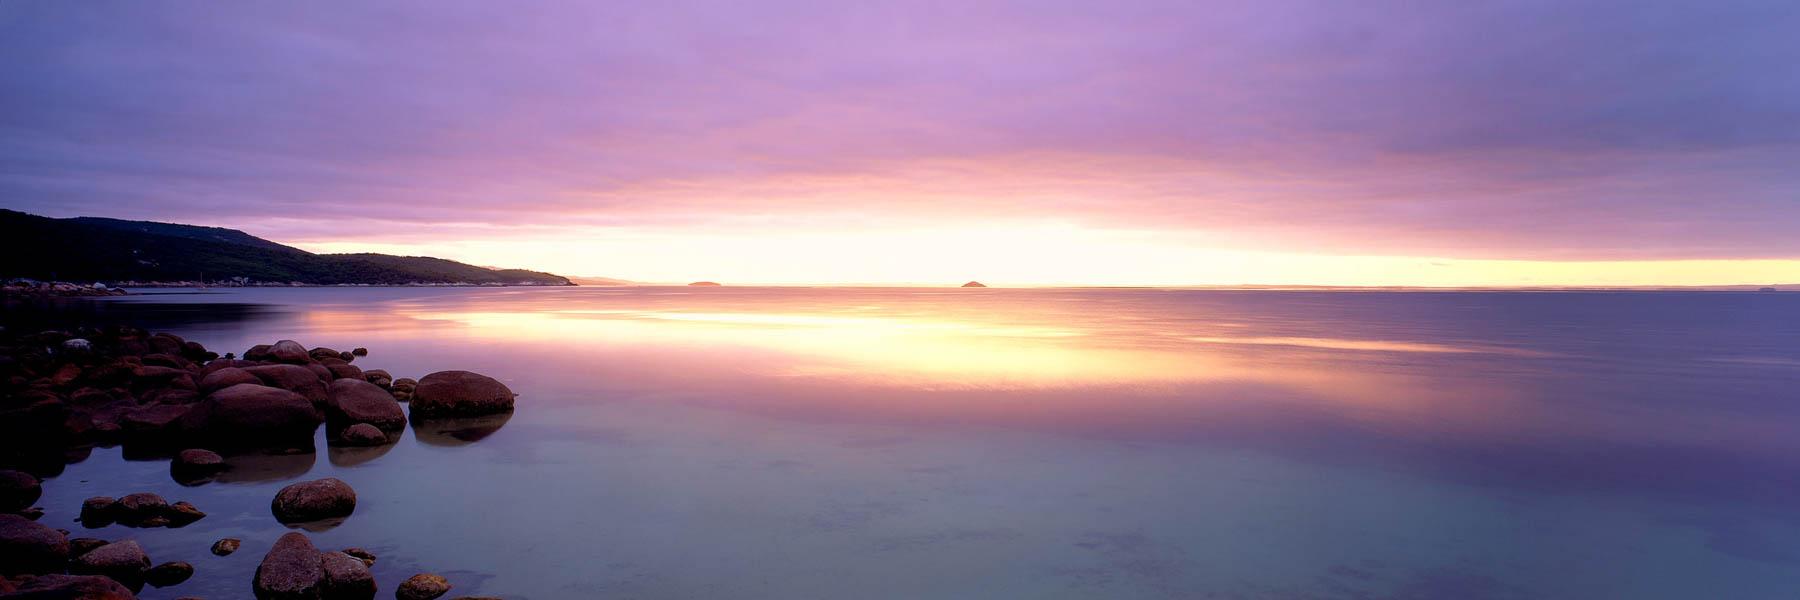 Golden sunrise over Freshwater Cove, Wilsons Promontory, Victoria, Australia.